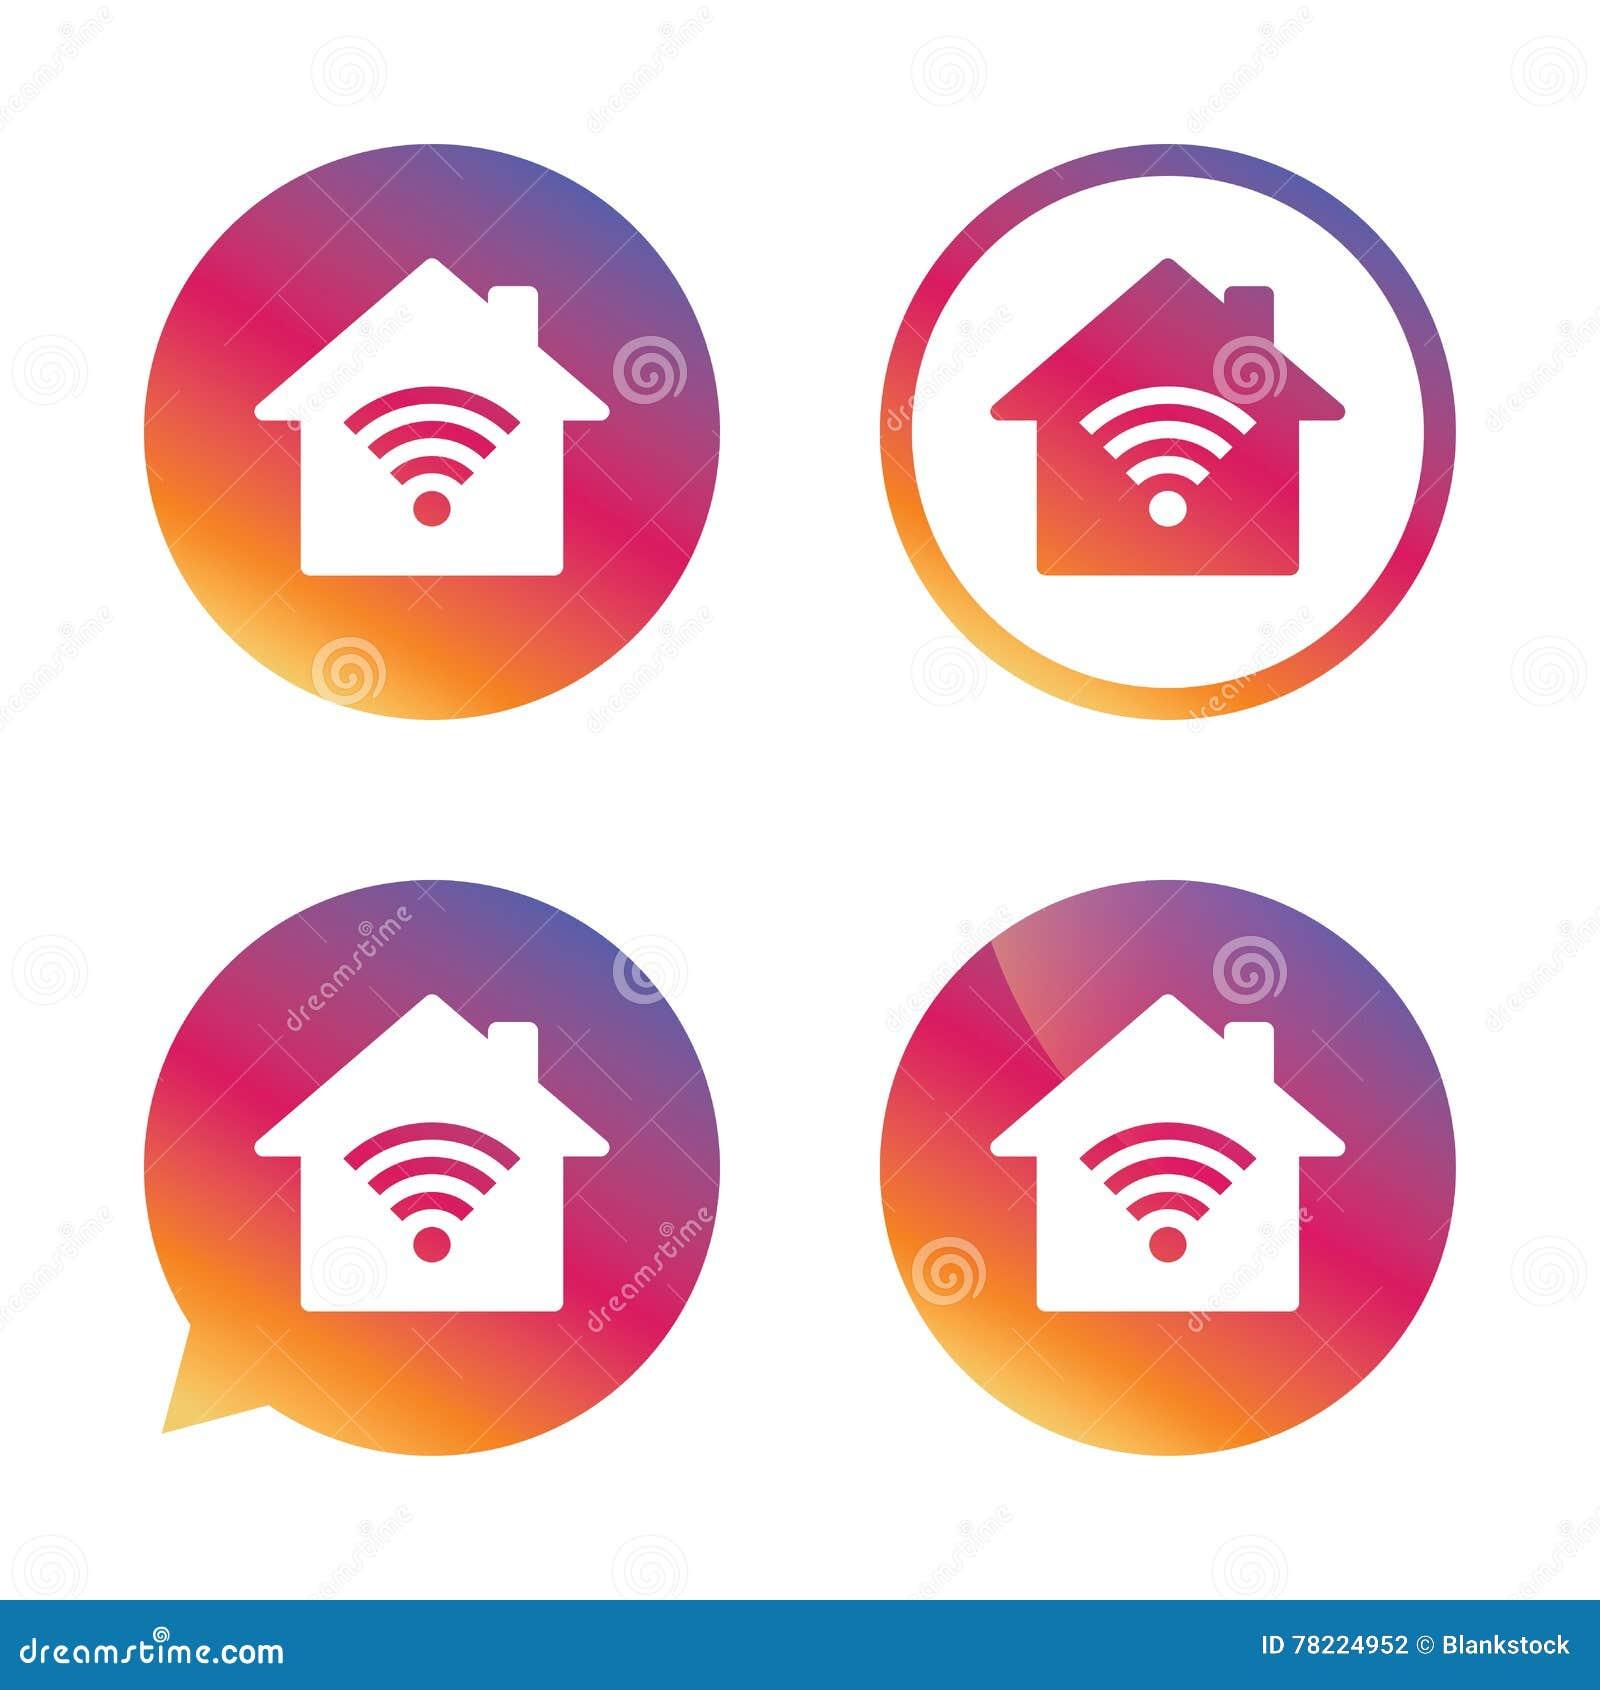 Home Wifi Sign Wifi Symbol Wireless Network Stock Vector - Home wireless network design